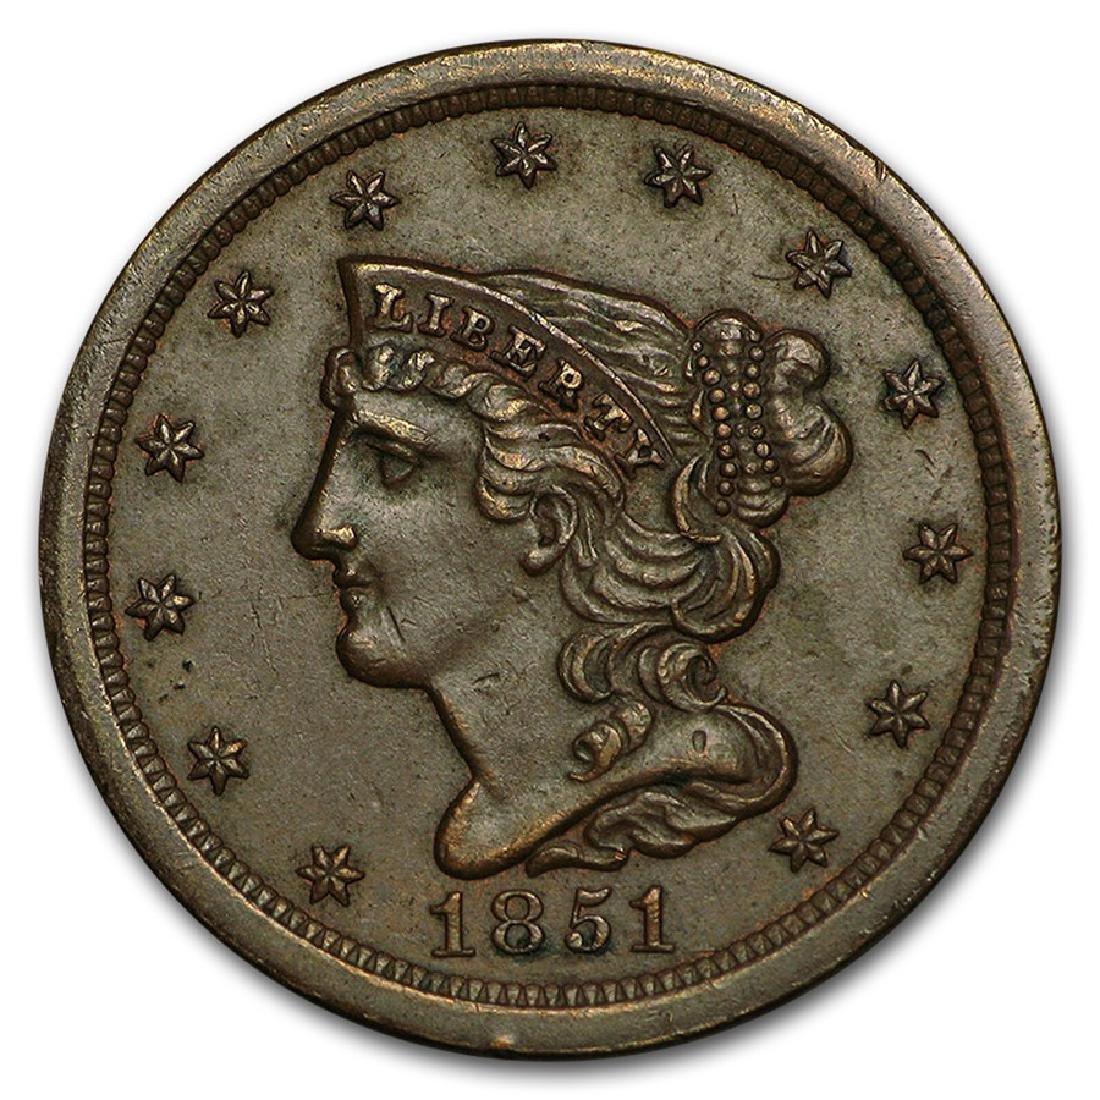 1851 Liberty Half Cent Coin